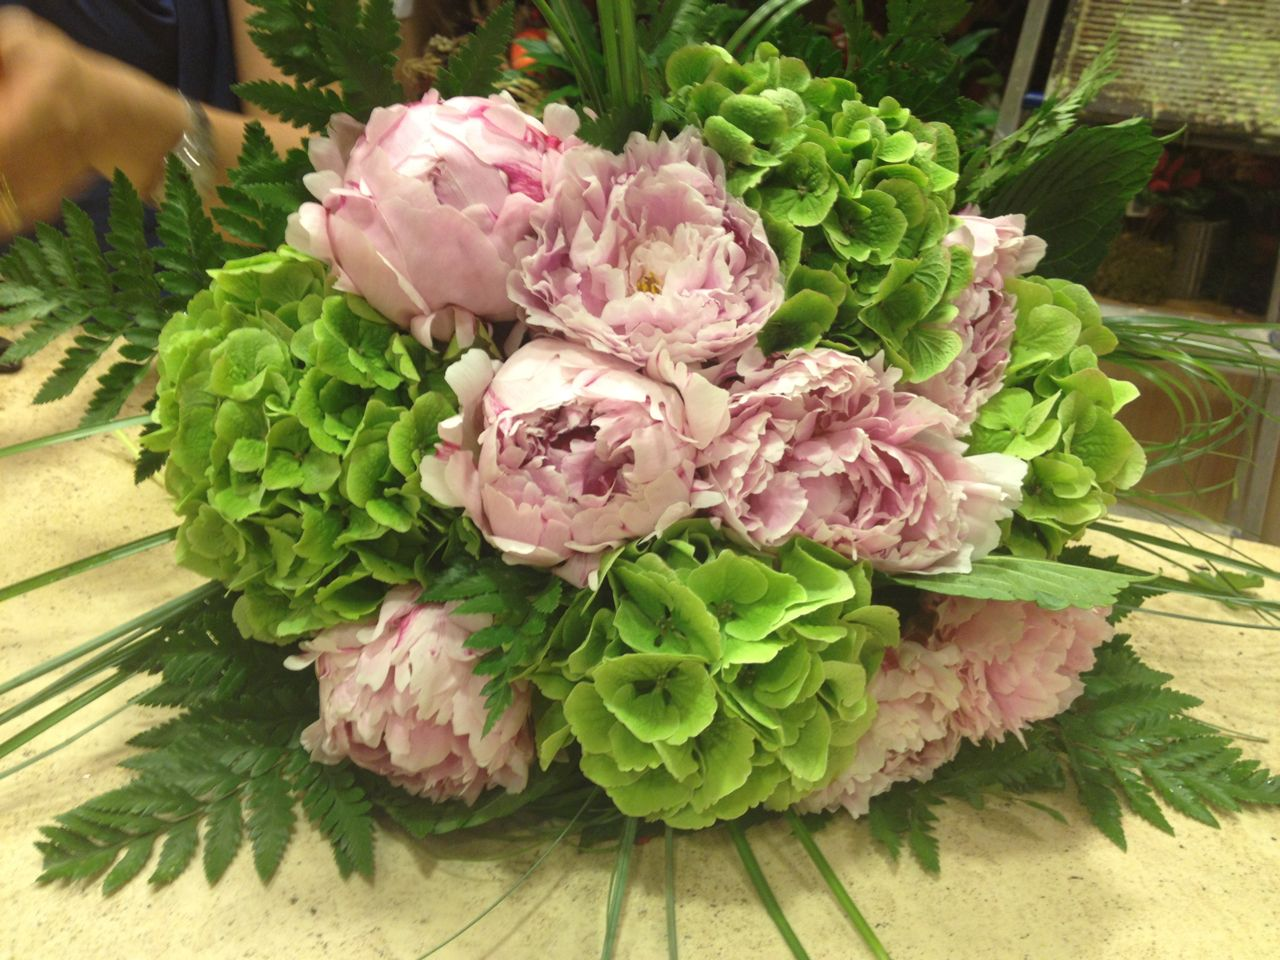 Centrotavola Ortensie E Peonie : Elisabetta fiori e piante bouquet di peonie rosa